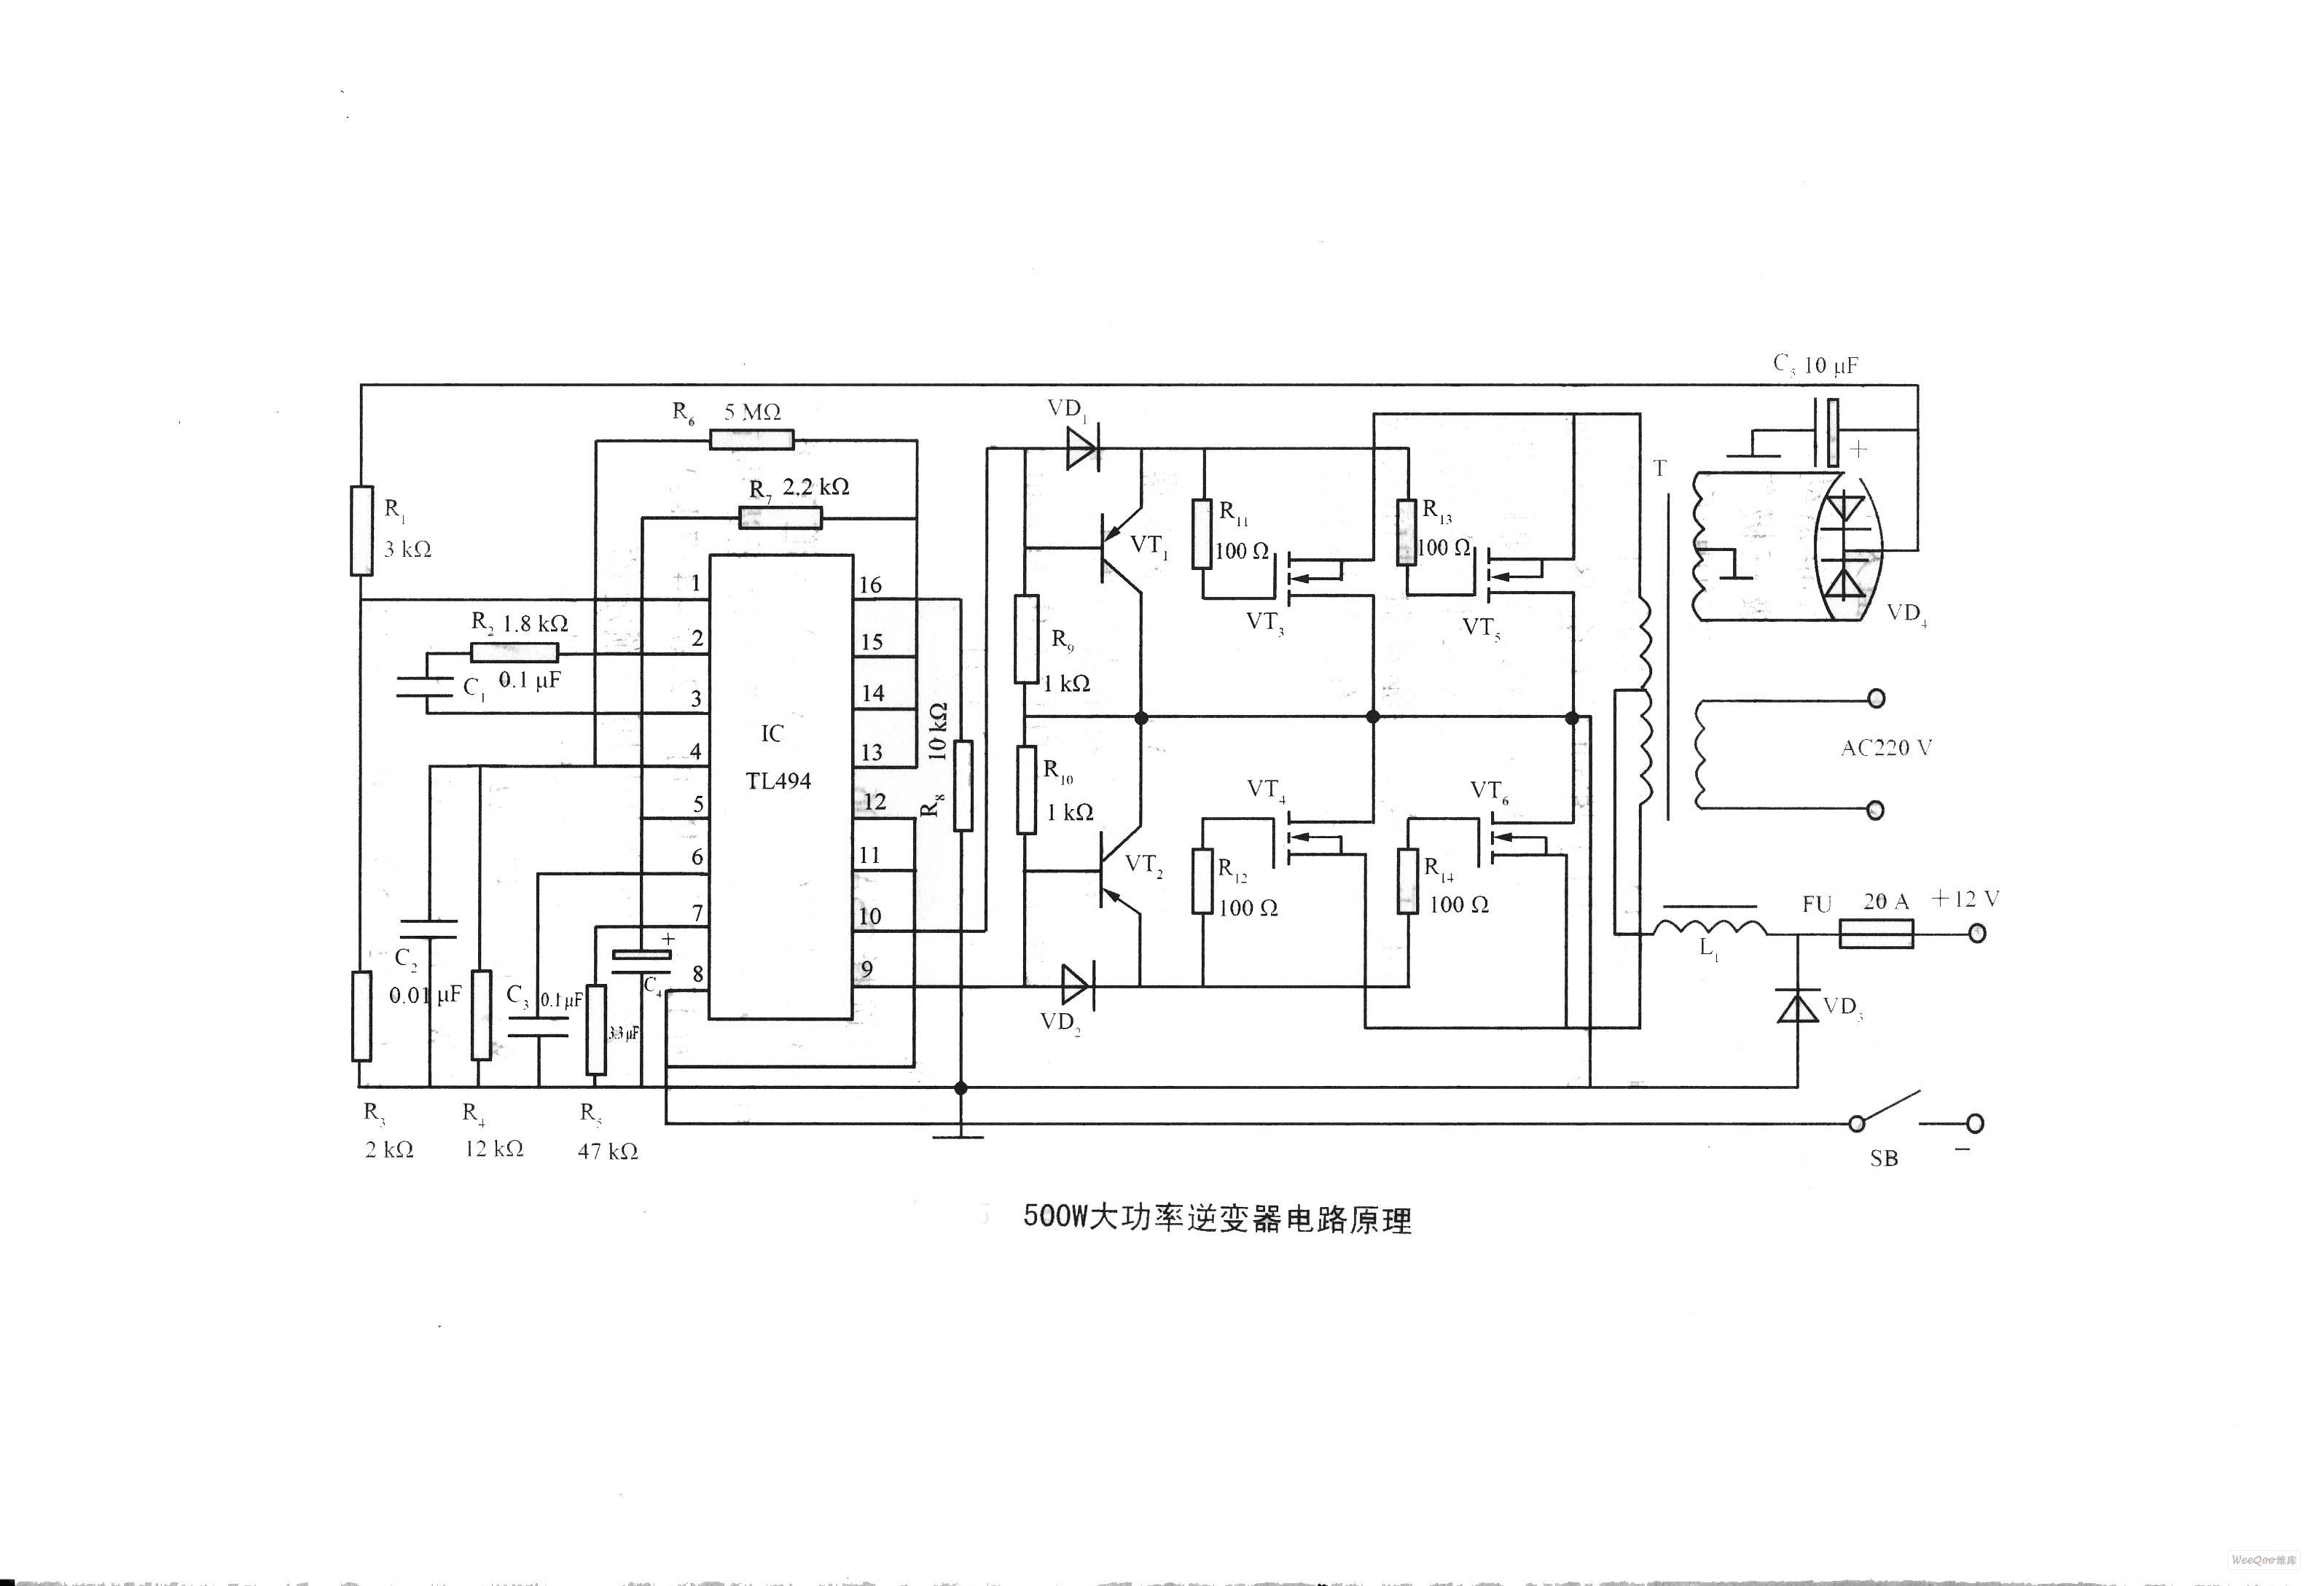 500W大功率变压器电路原理